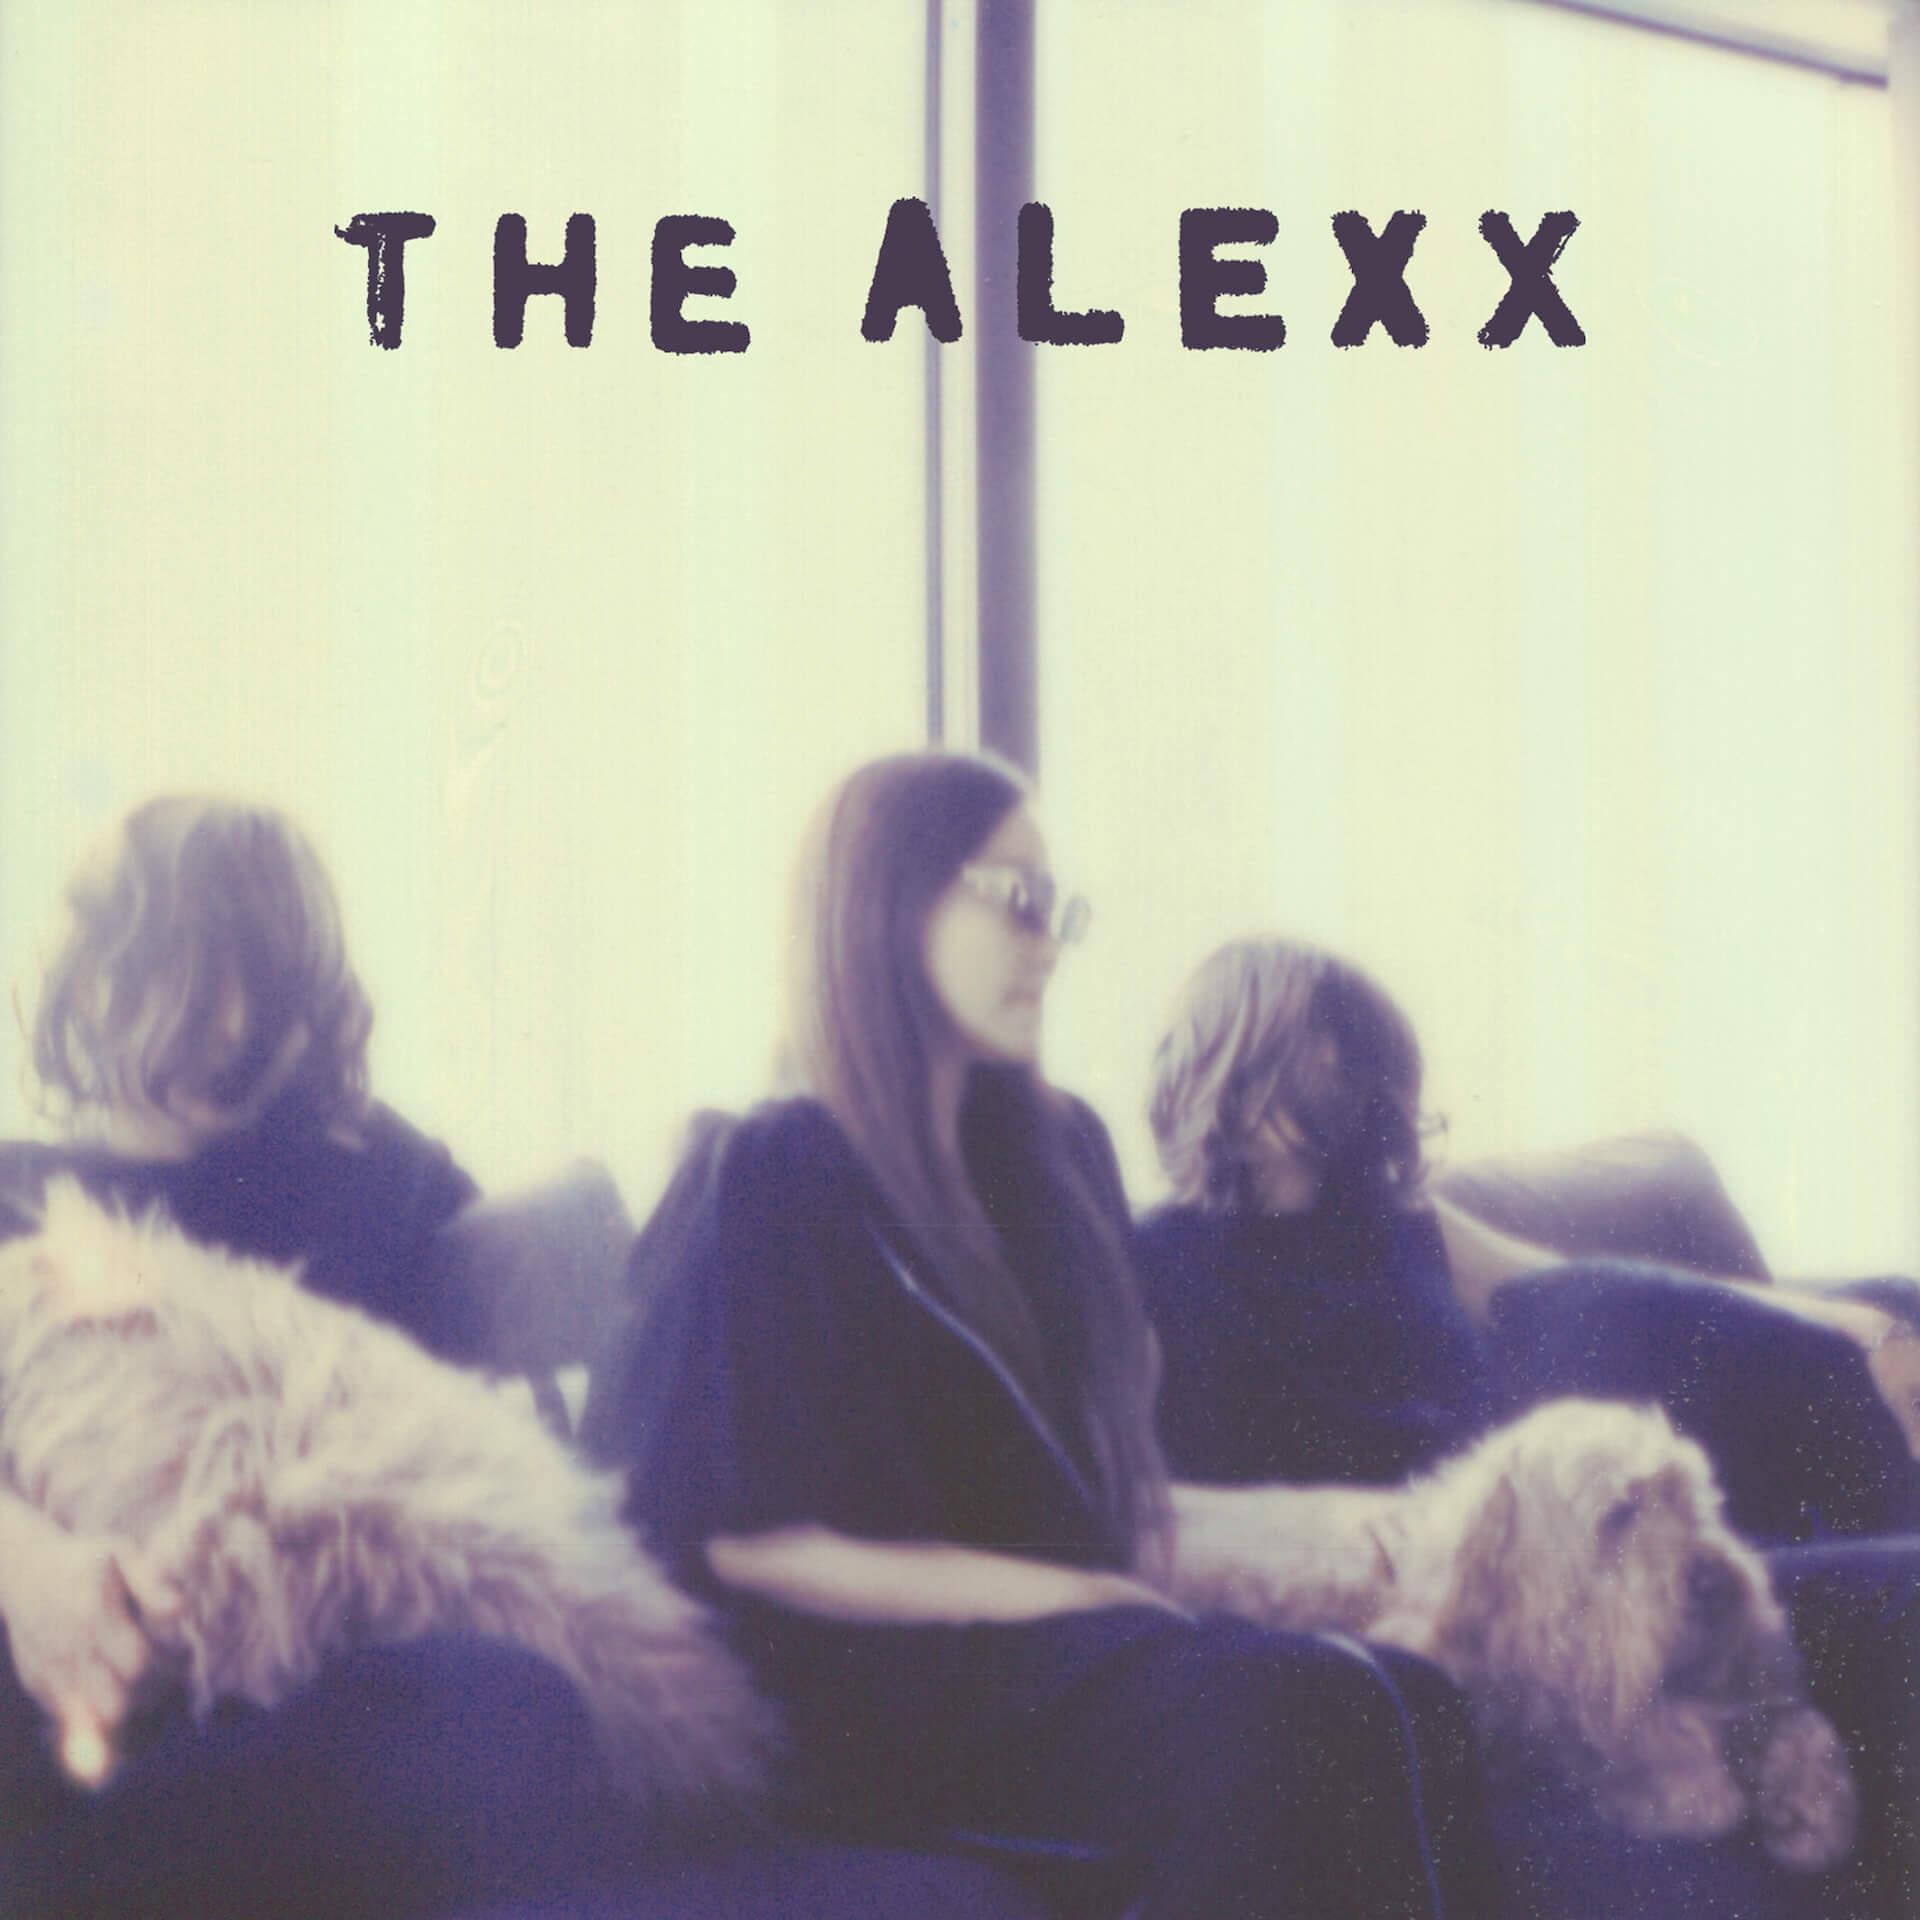 THE ALEXXが示す新しい陶酔の形|柴那典ライブレポート<SHIBUYA CLUB QUATTRO GAN-BAN NIGHT SPECIAL> music191220_thealexx_12-1